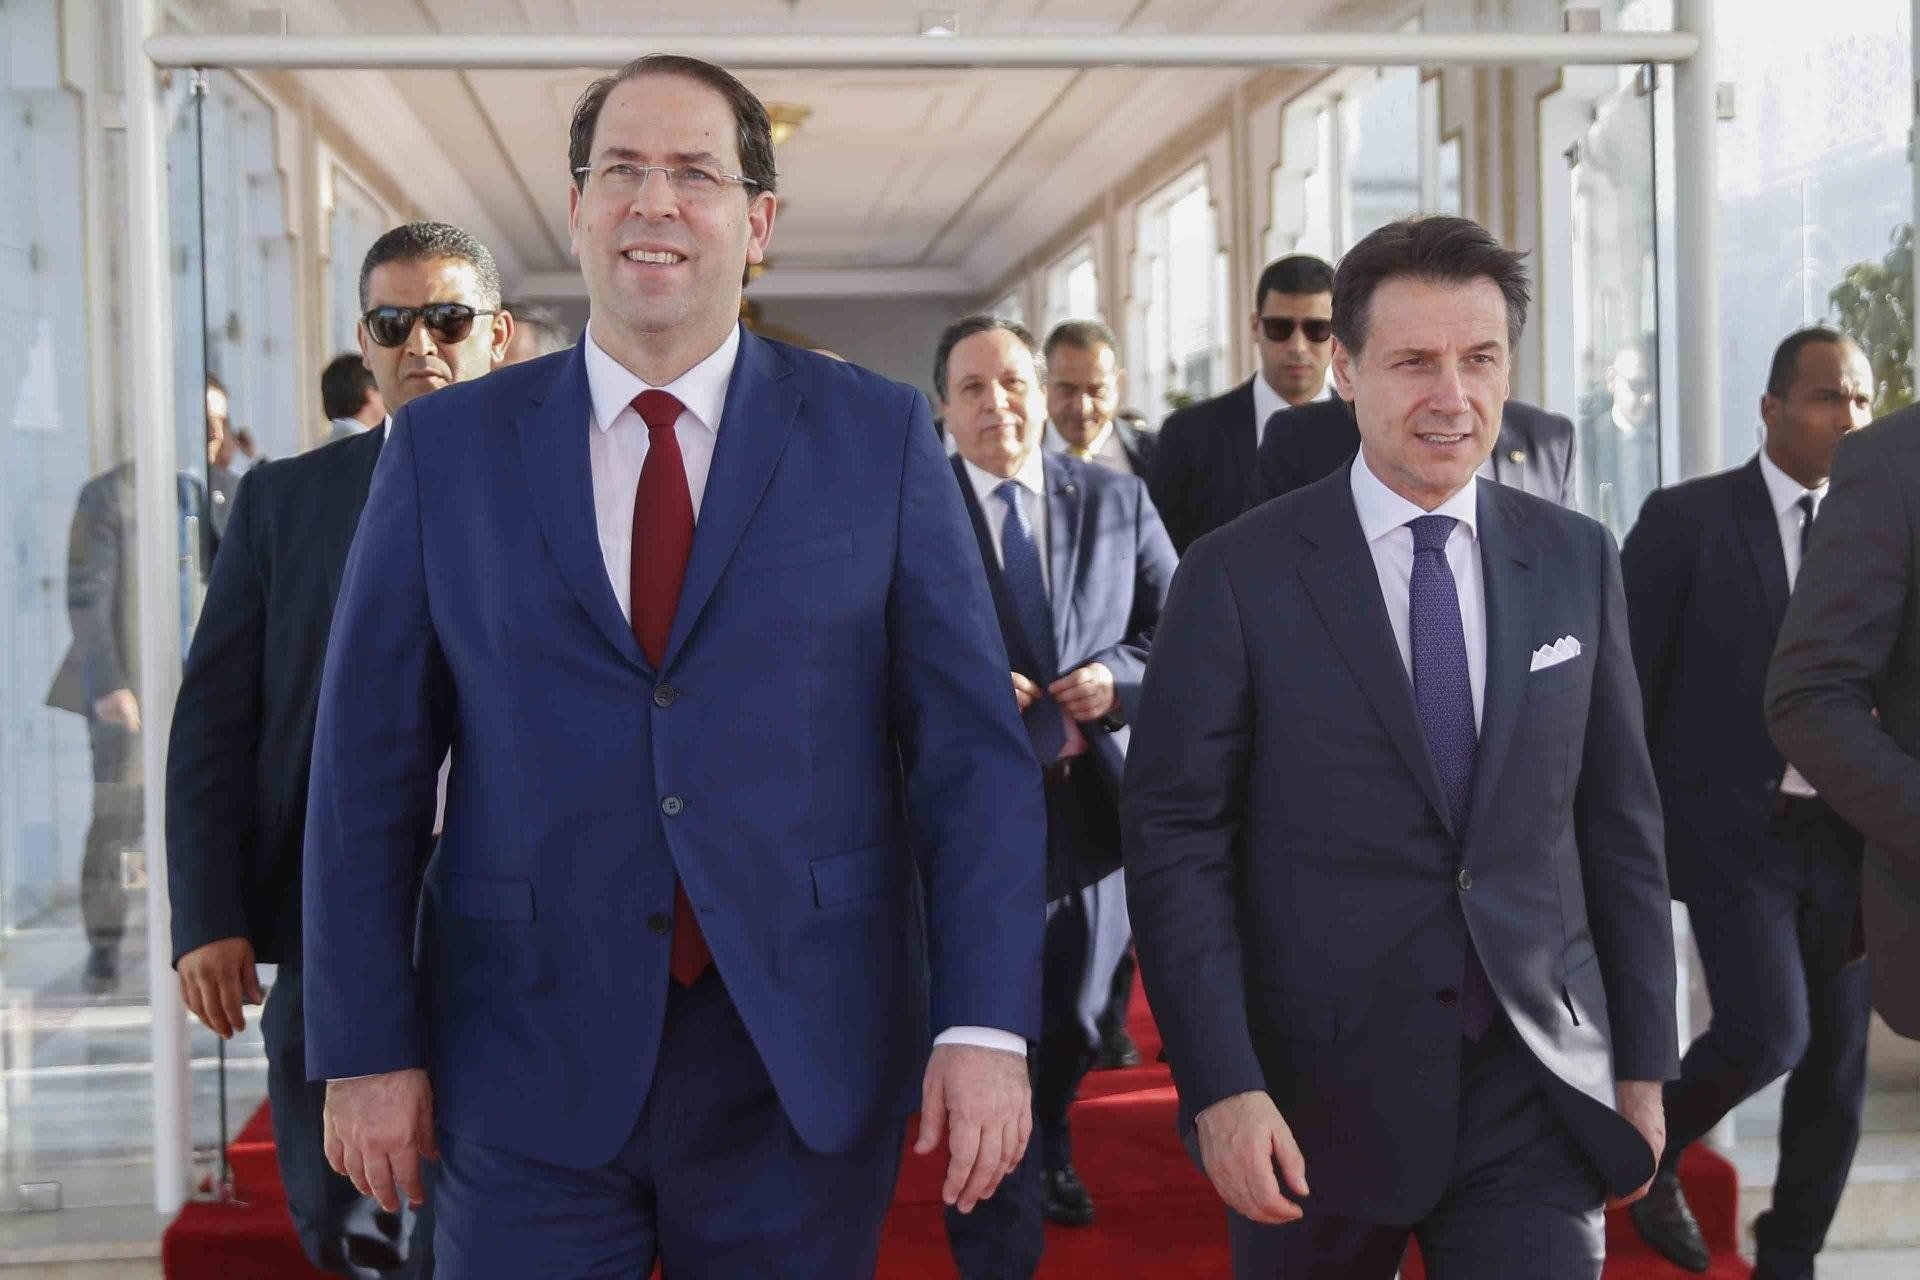 Tunisie - Italie: 7 accords signés, une coopération